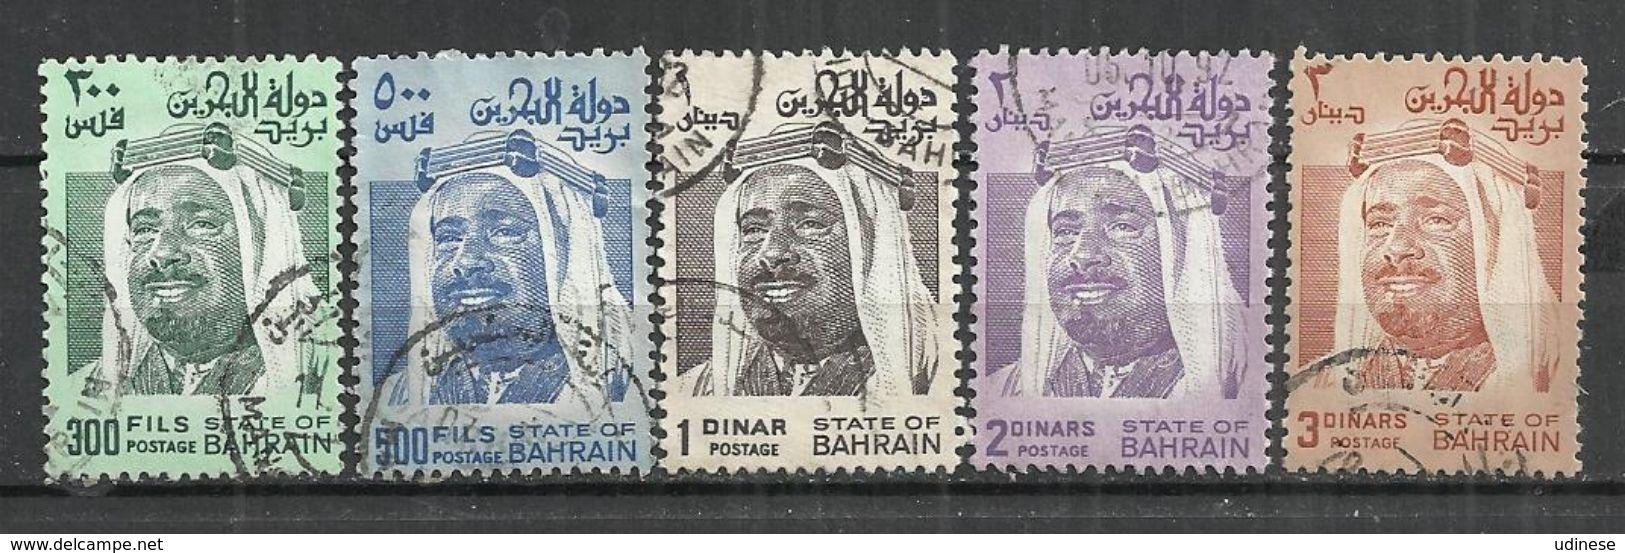 BAHRAIN 1976 - EMIR SHEIKH SALMAN BIN HAMED AL-KHALIFA - LOT OF 5 DIFFERENT - USED OBLITERE GESTEMPELT USADO - Bahreïn (1965-...)